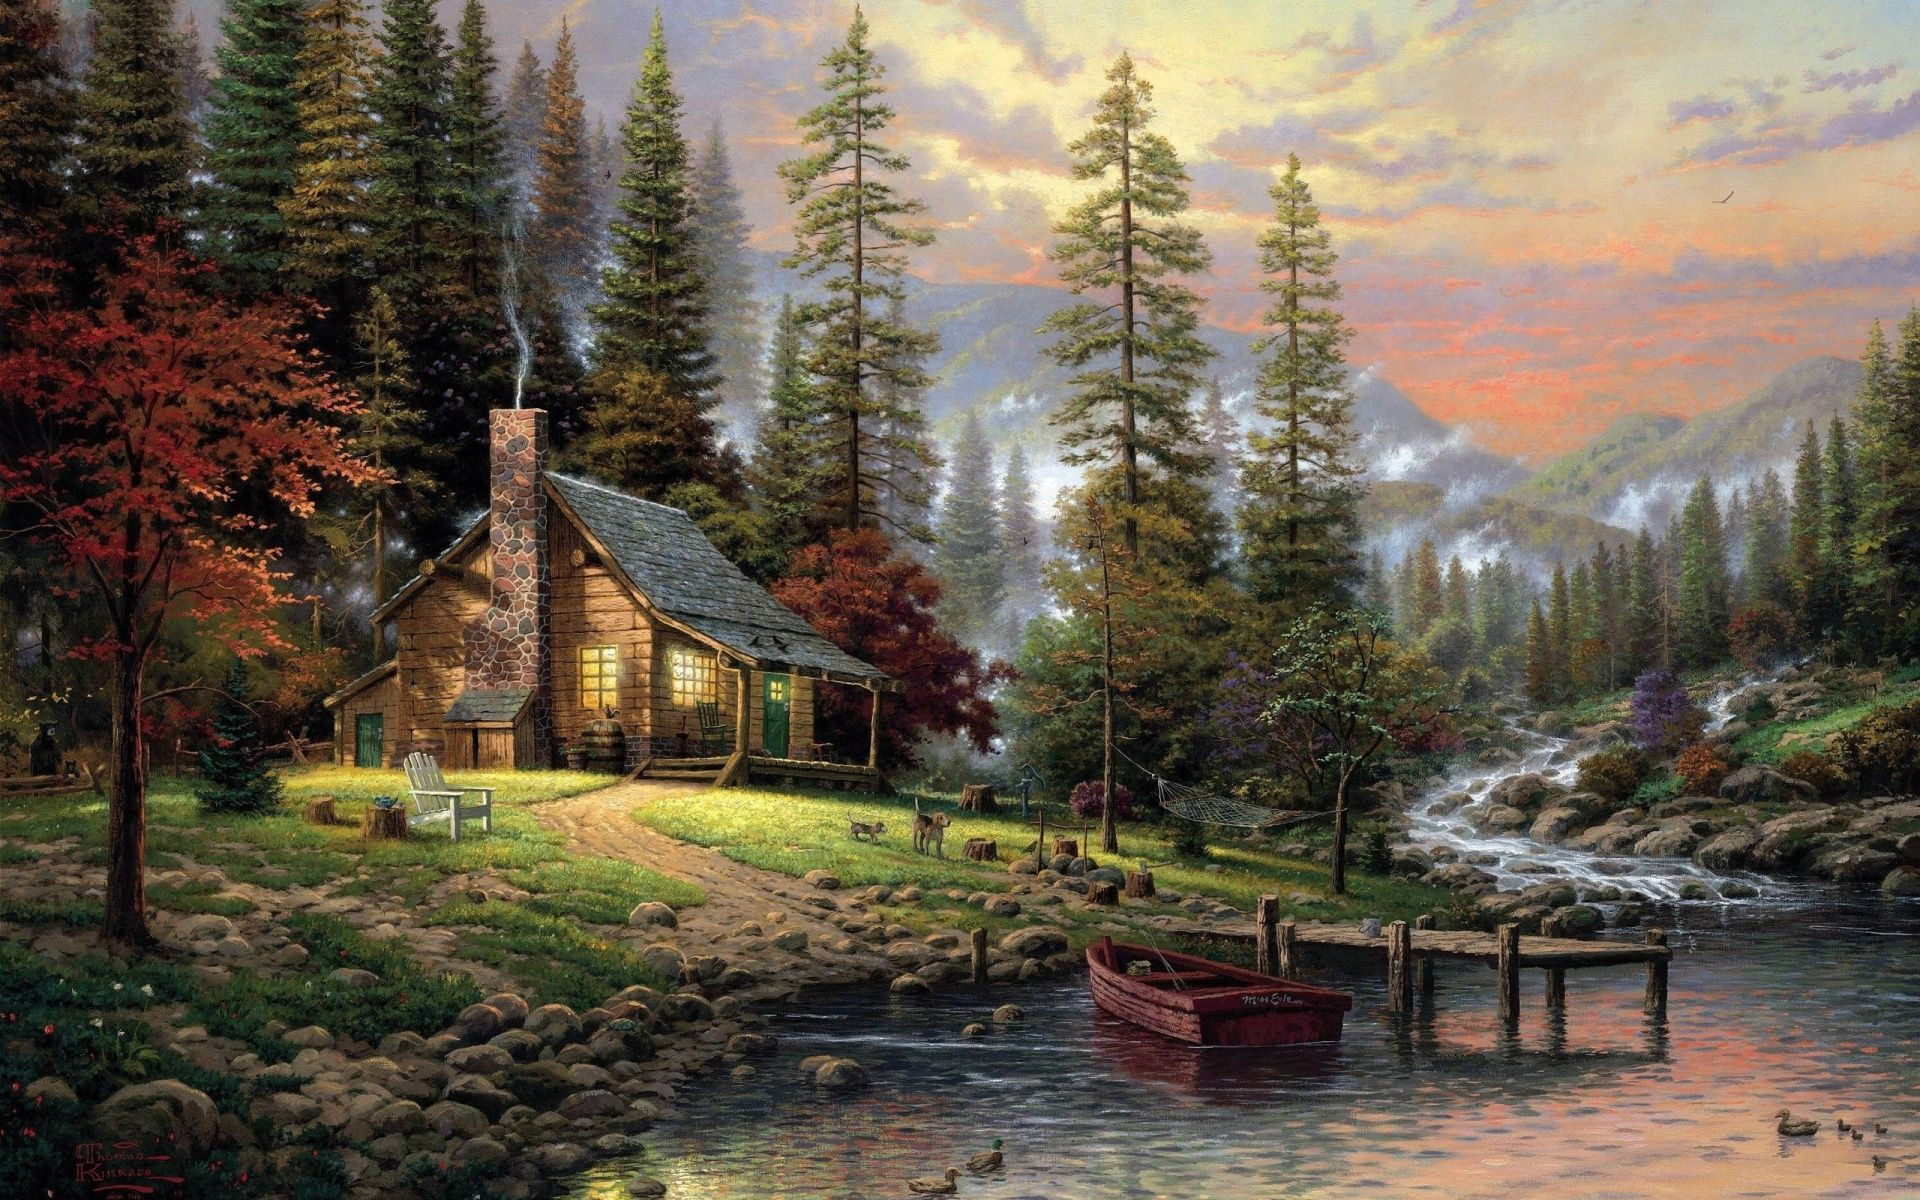 Fall Mountain Cabin Wallpapers Top Free Fall Mountain Cabin Backgrounds Wallpaperaccess